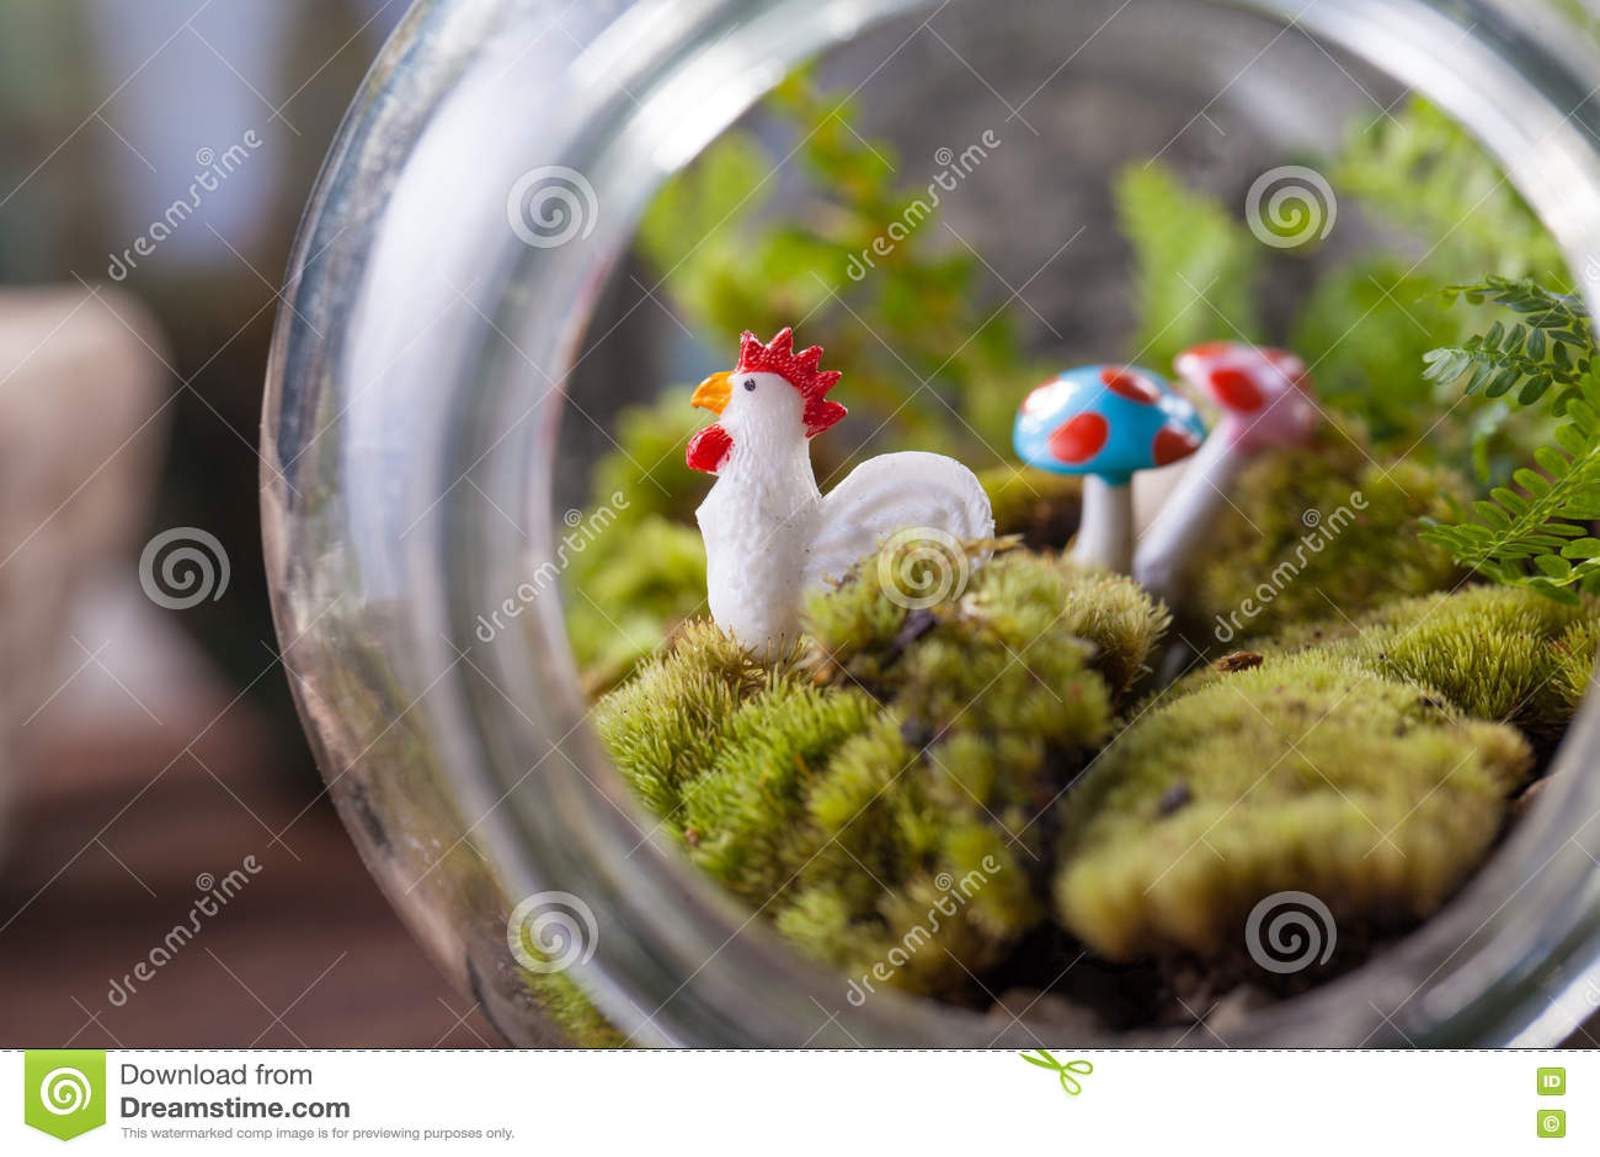 A Terrarium Bottle Stock Image Image Of Garden Flamingo 80872269